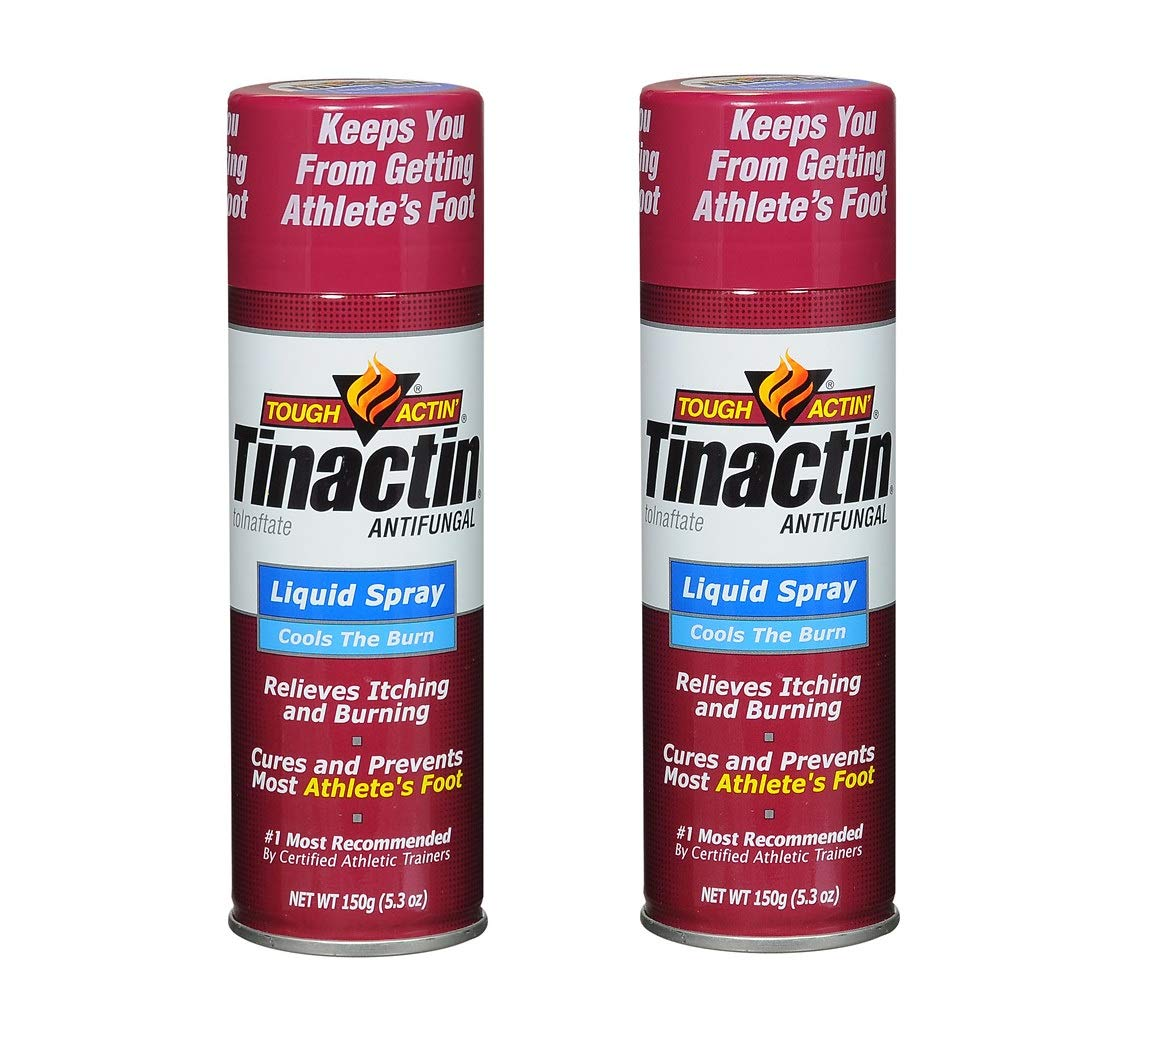 Tinactin Antifungal Liquid Spray 5.3 Oz (2 Pck)